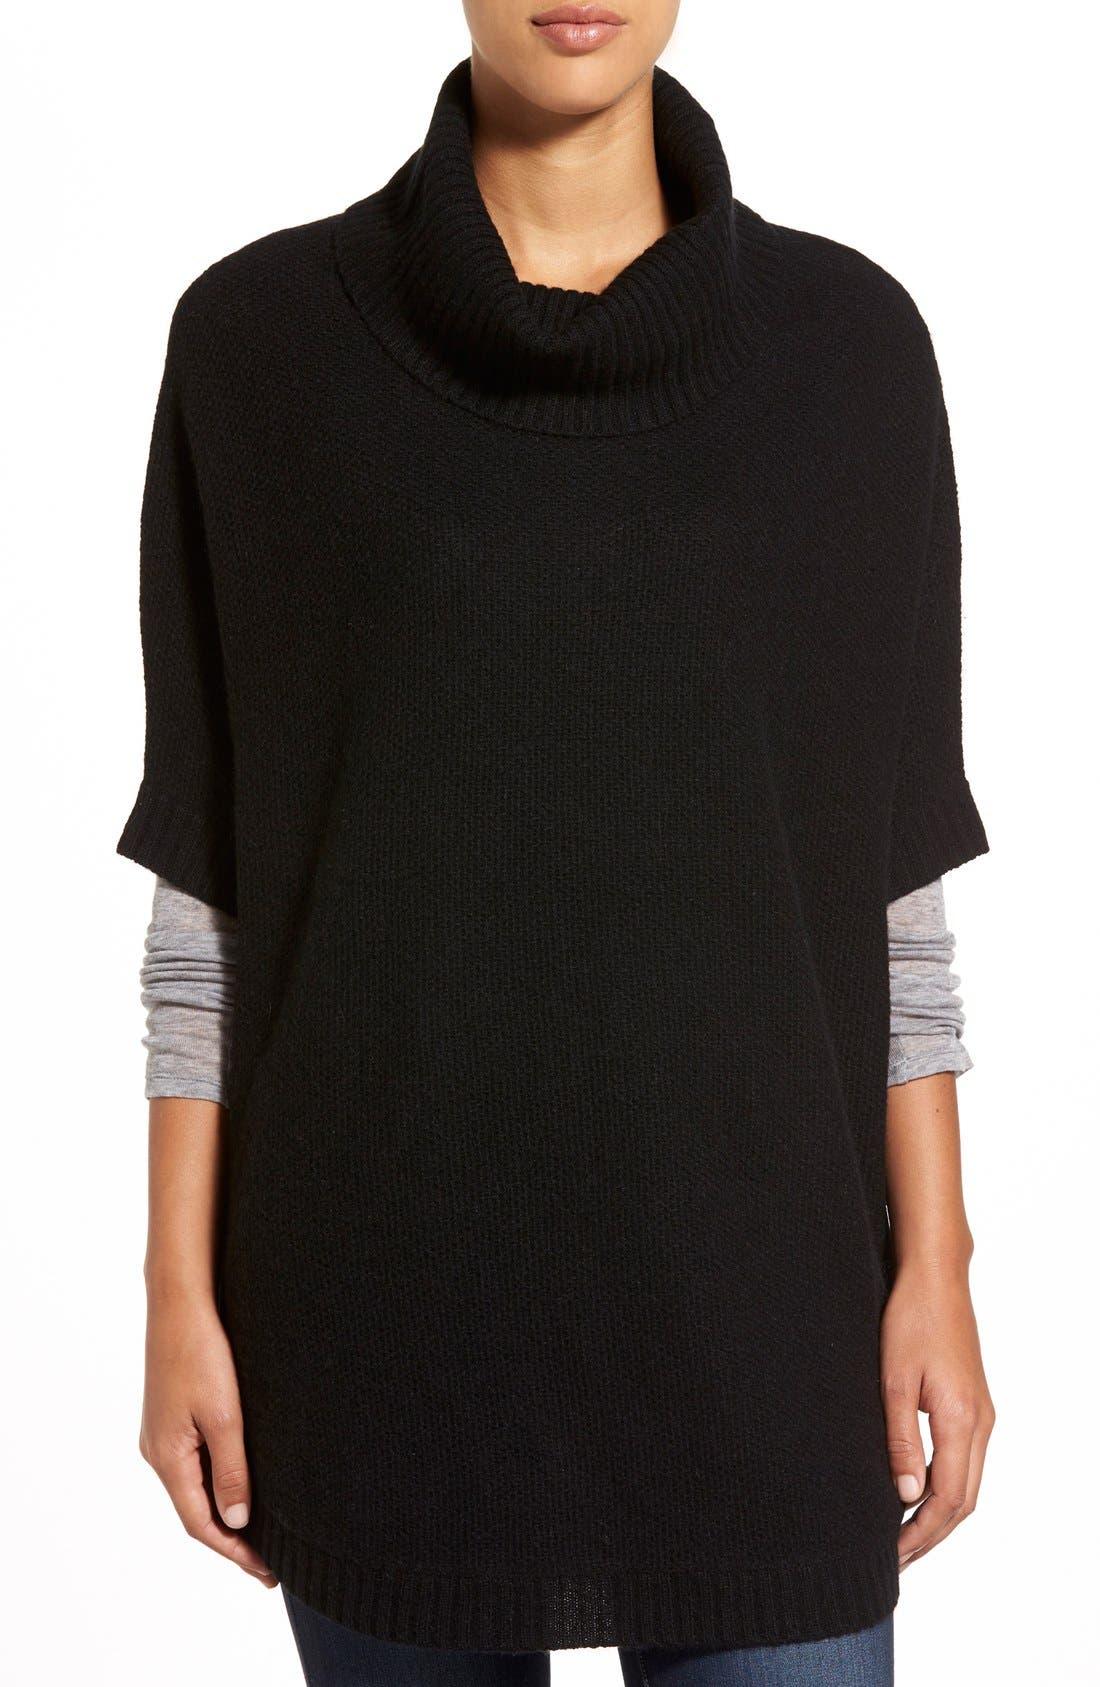 Main Image - Nordstrom Cashmere Turtleneck Sweater